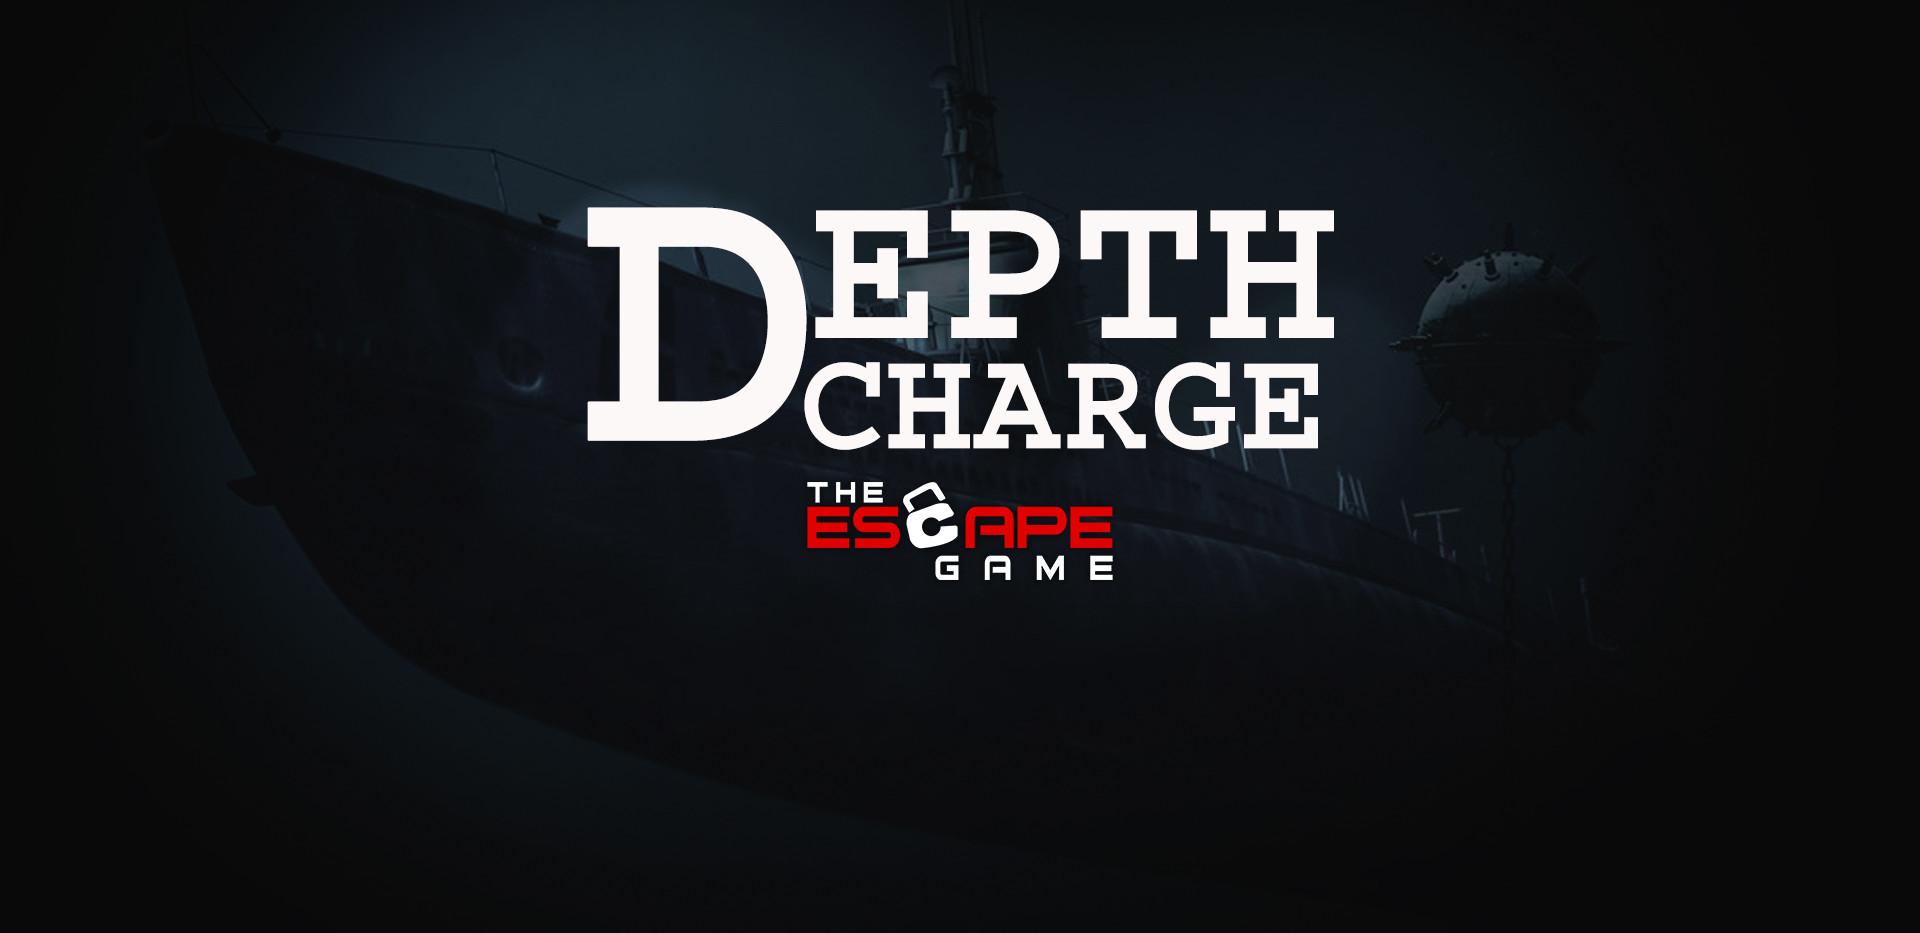 Depth charge Waiter.jpg